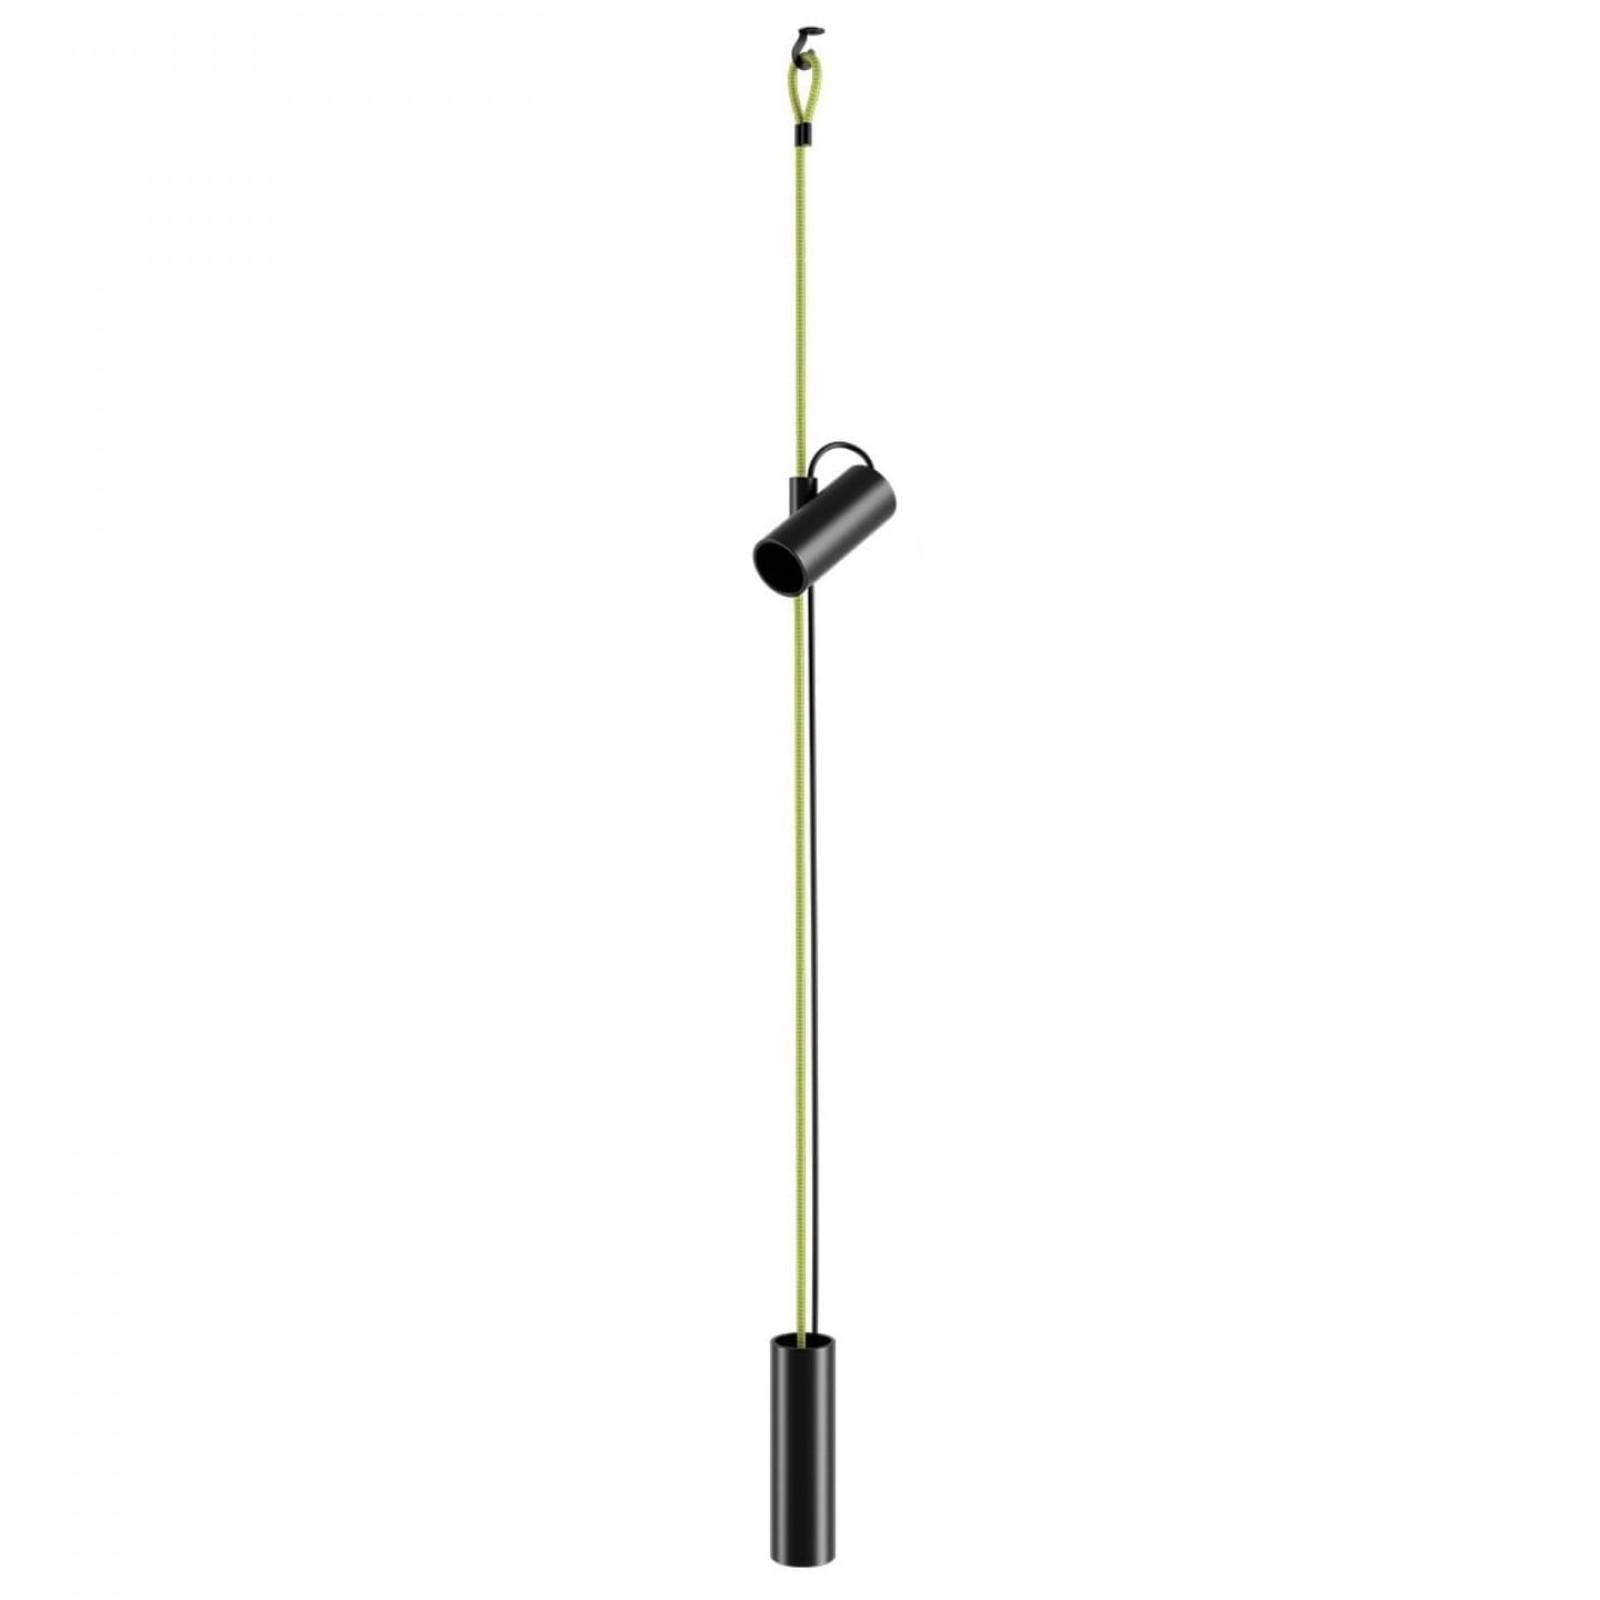 Cima Suspension Floor Lamp (Yellow) - Lodes